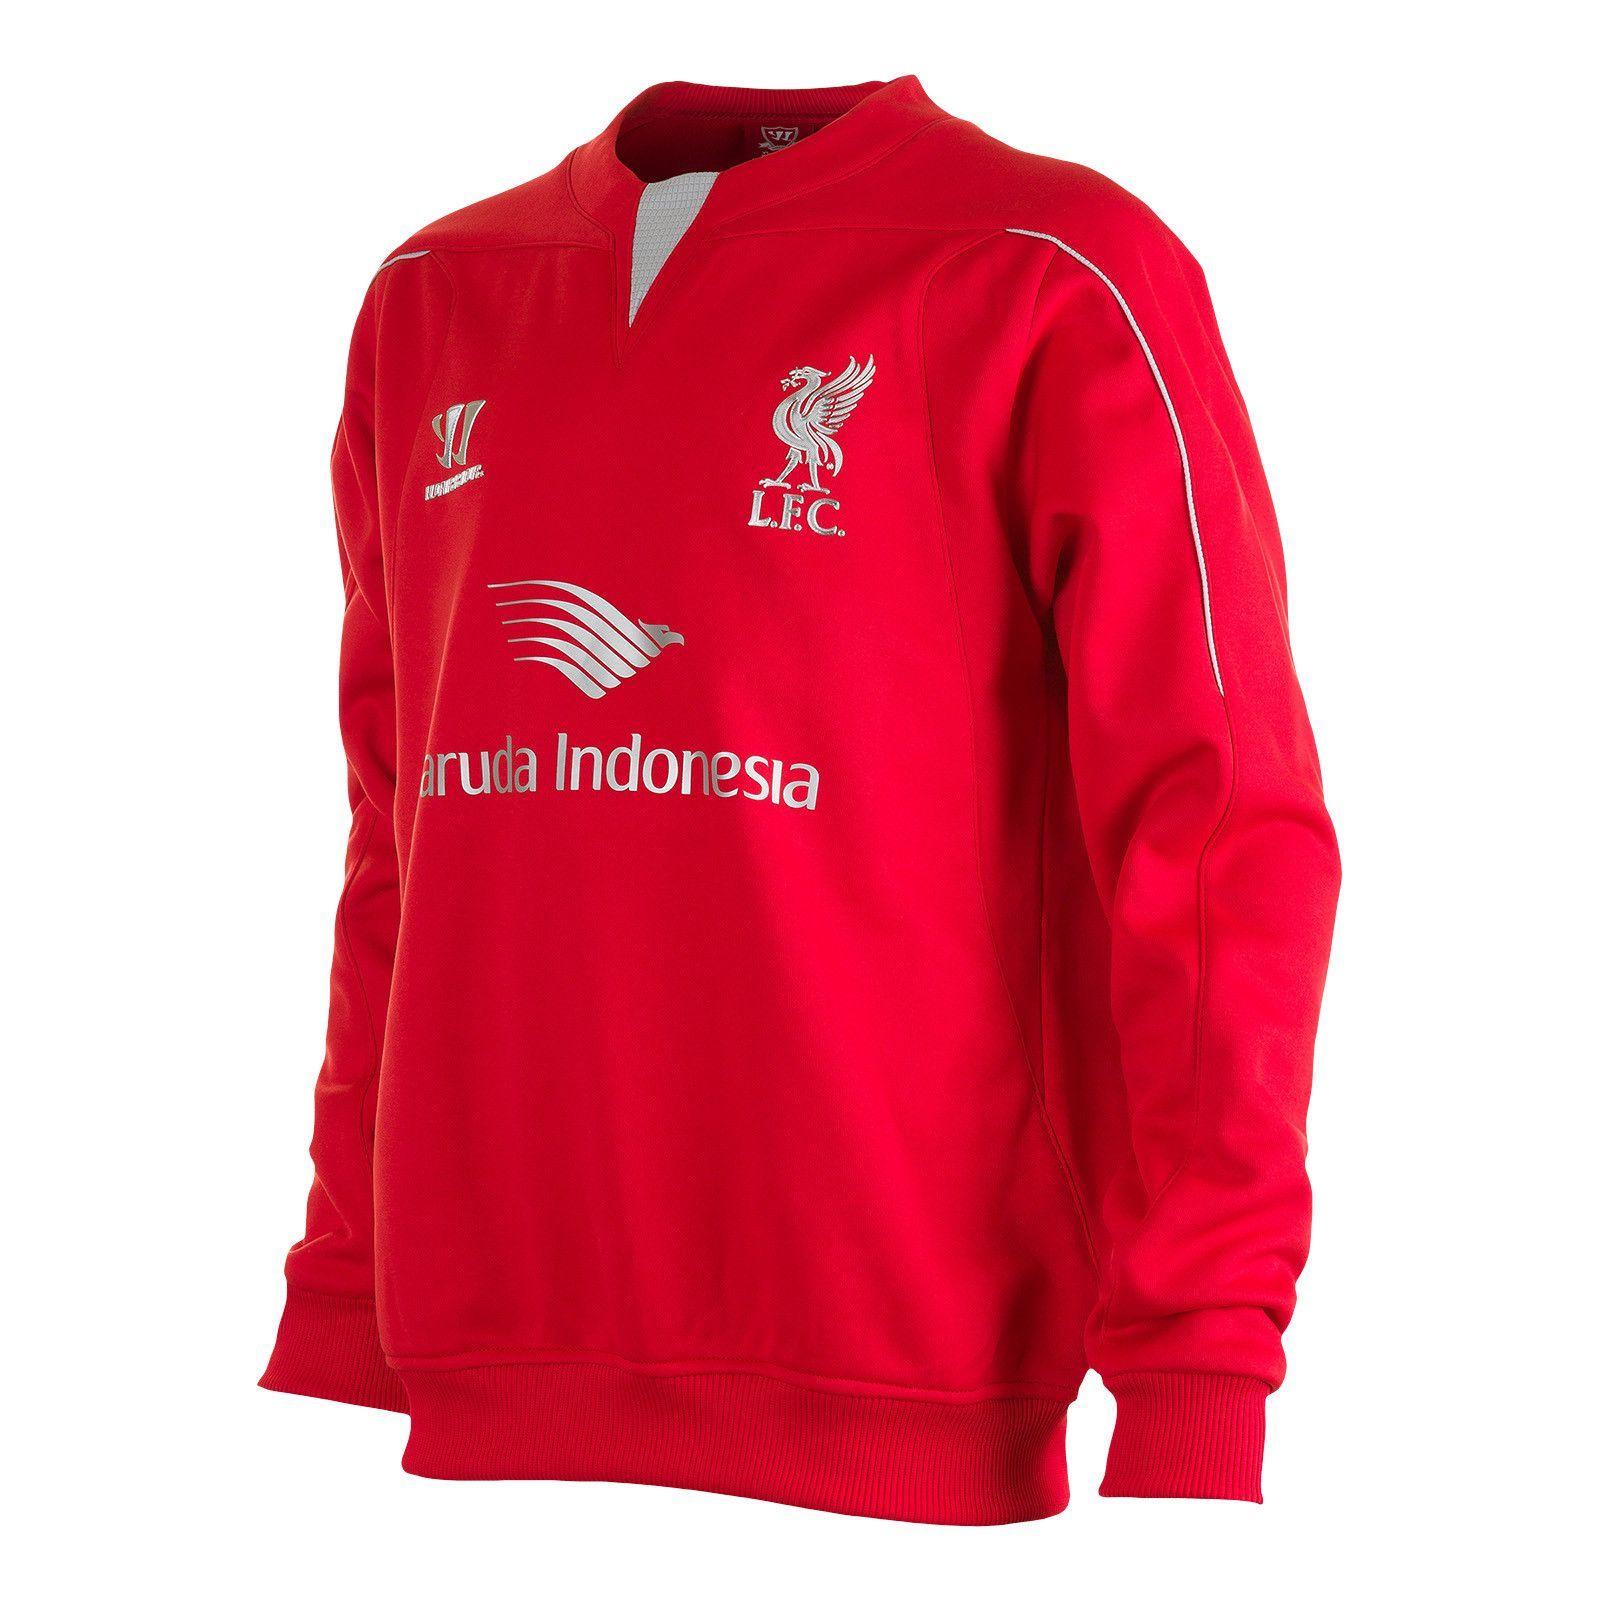 2014/15 Warrior Youth Liverpool Training Sweatshirt (With